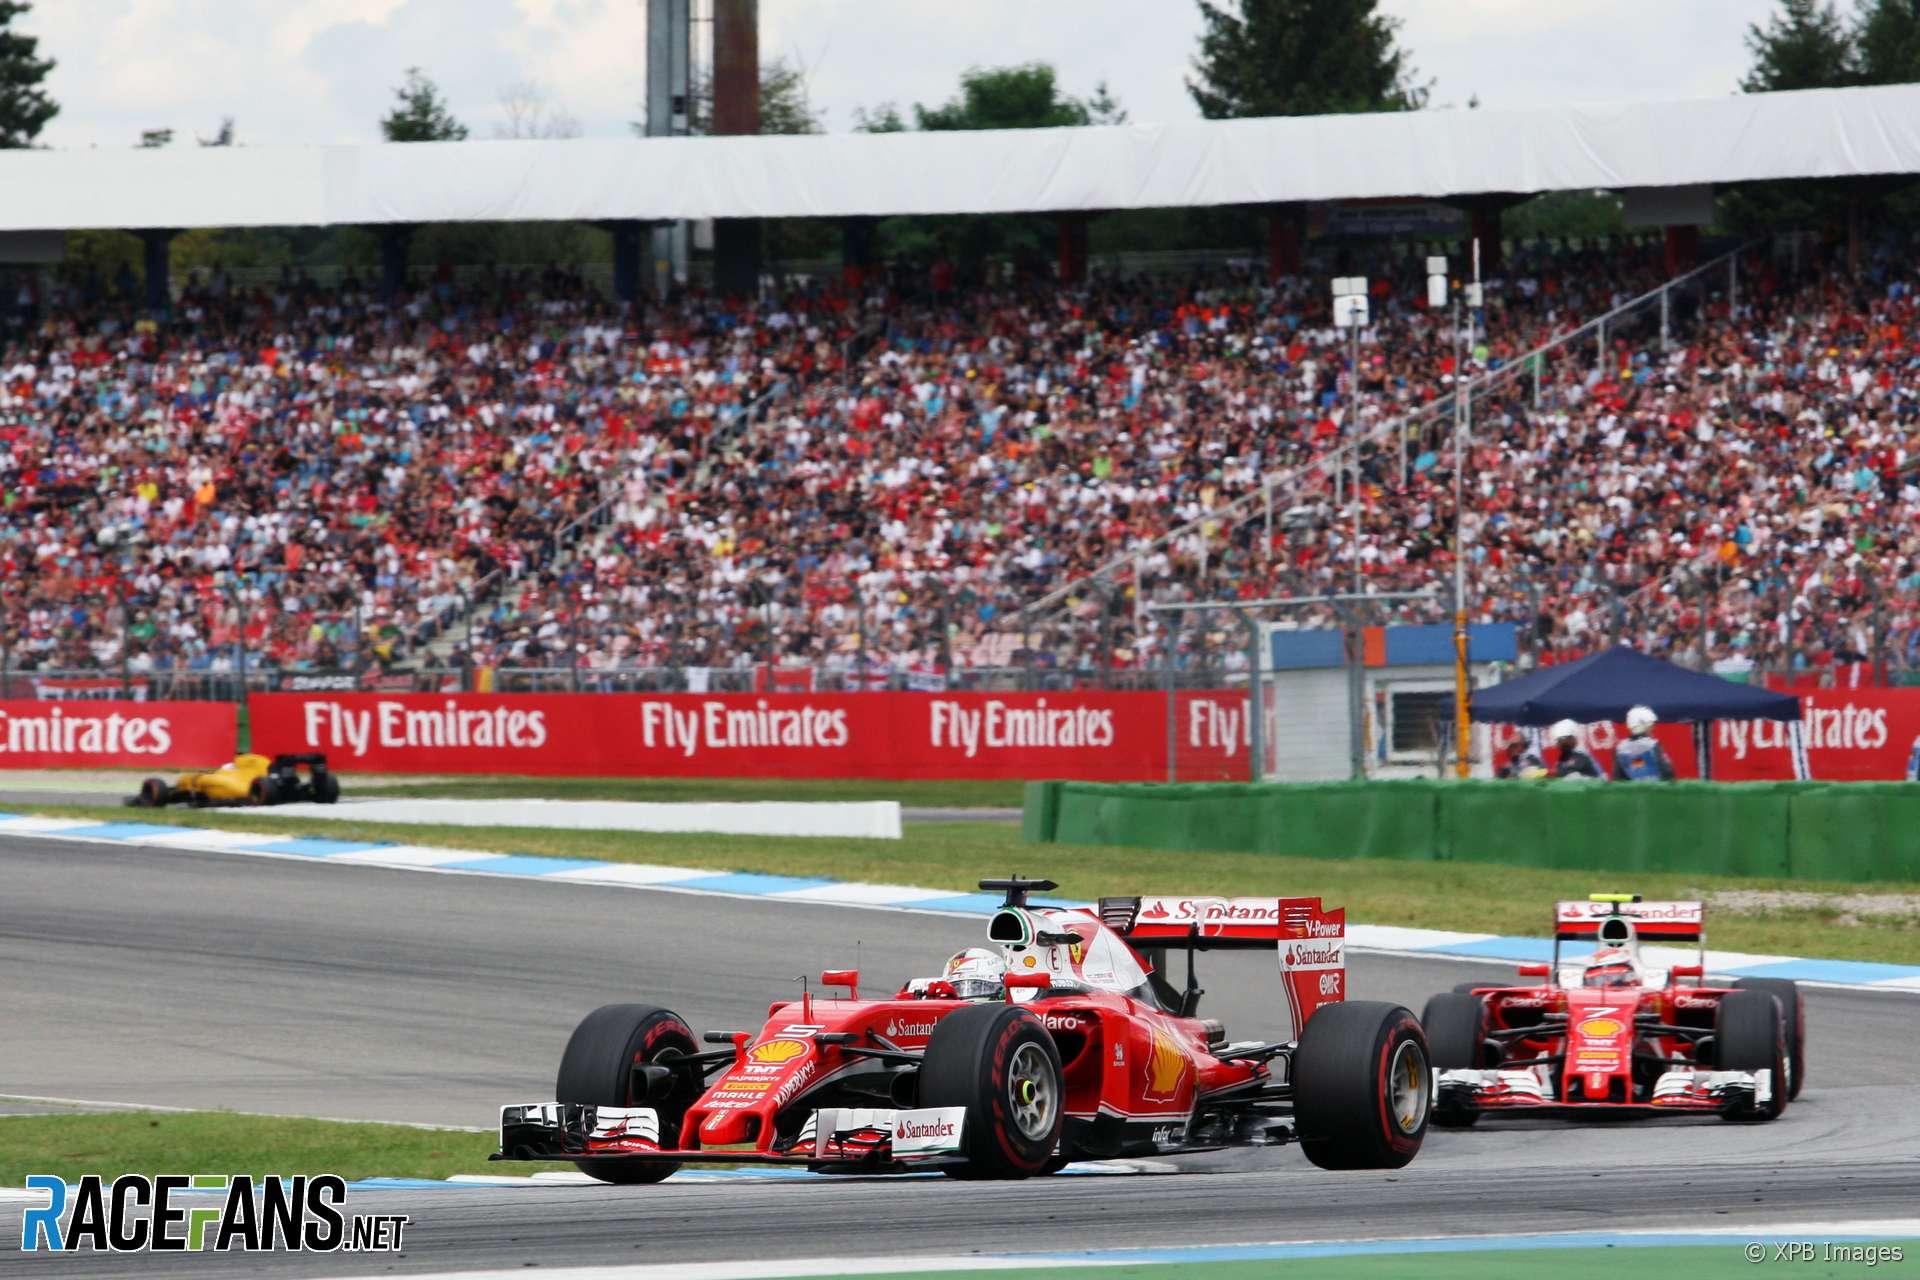 Sebastian Vettel, Ferrari, Hockenheim, 2016